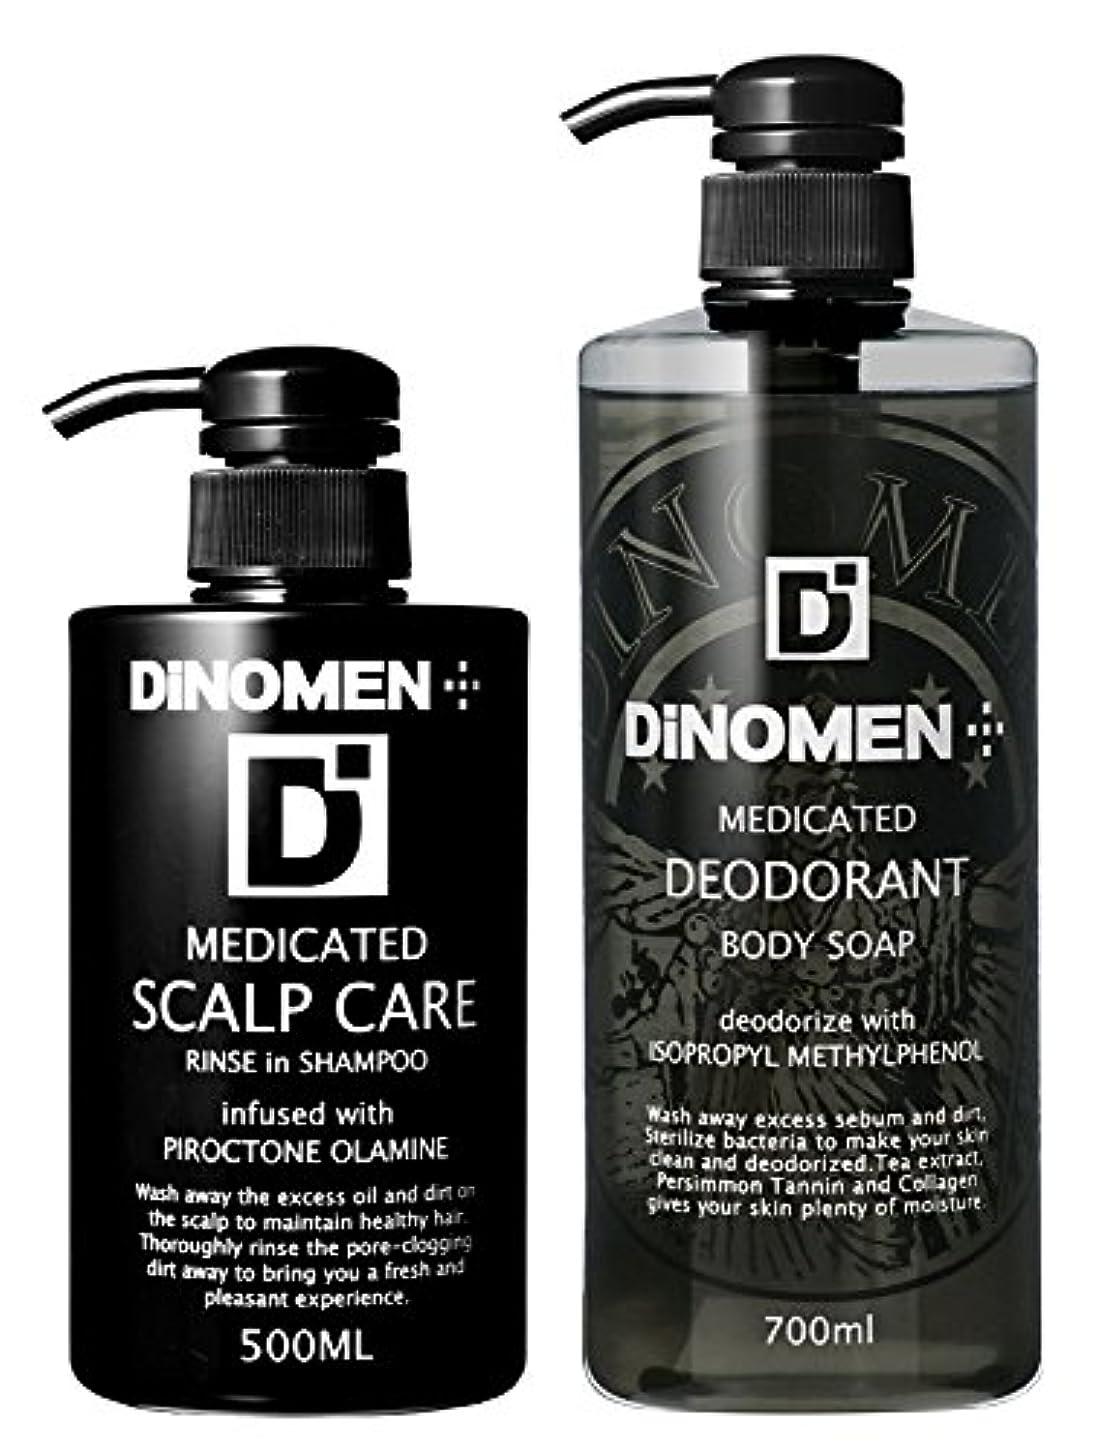 DiNOMEN 薬用スカルプケアリンスインシャンプー500ml & 薬用デオドラントボディソープセット [医薬部外品]